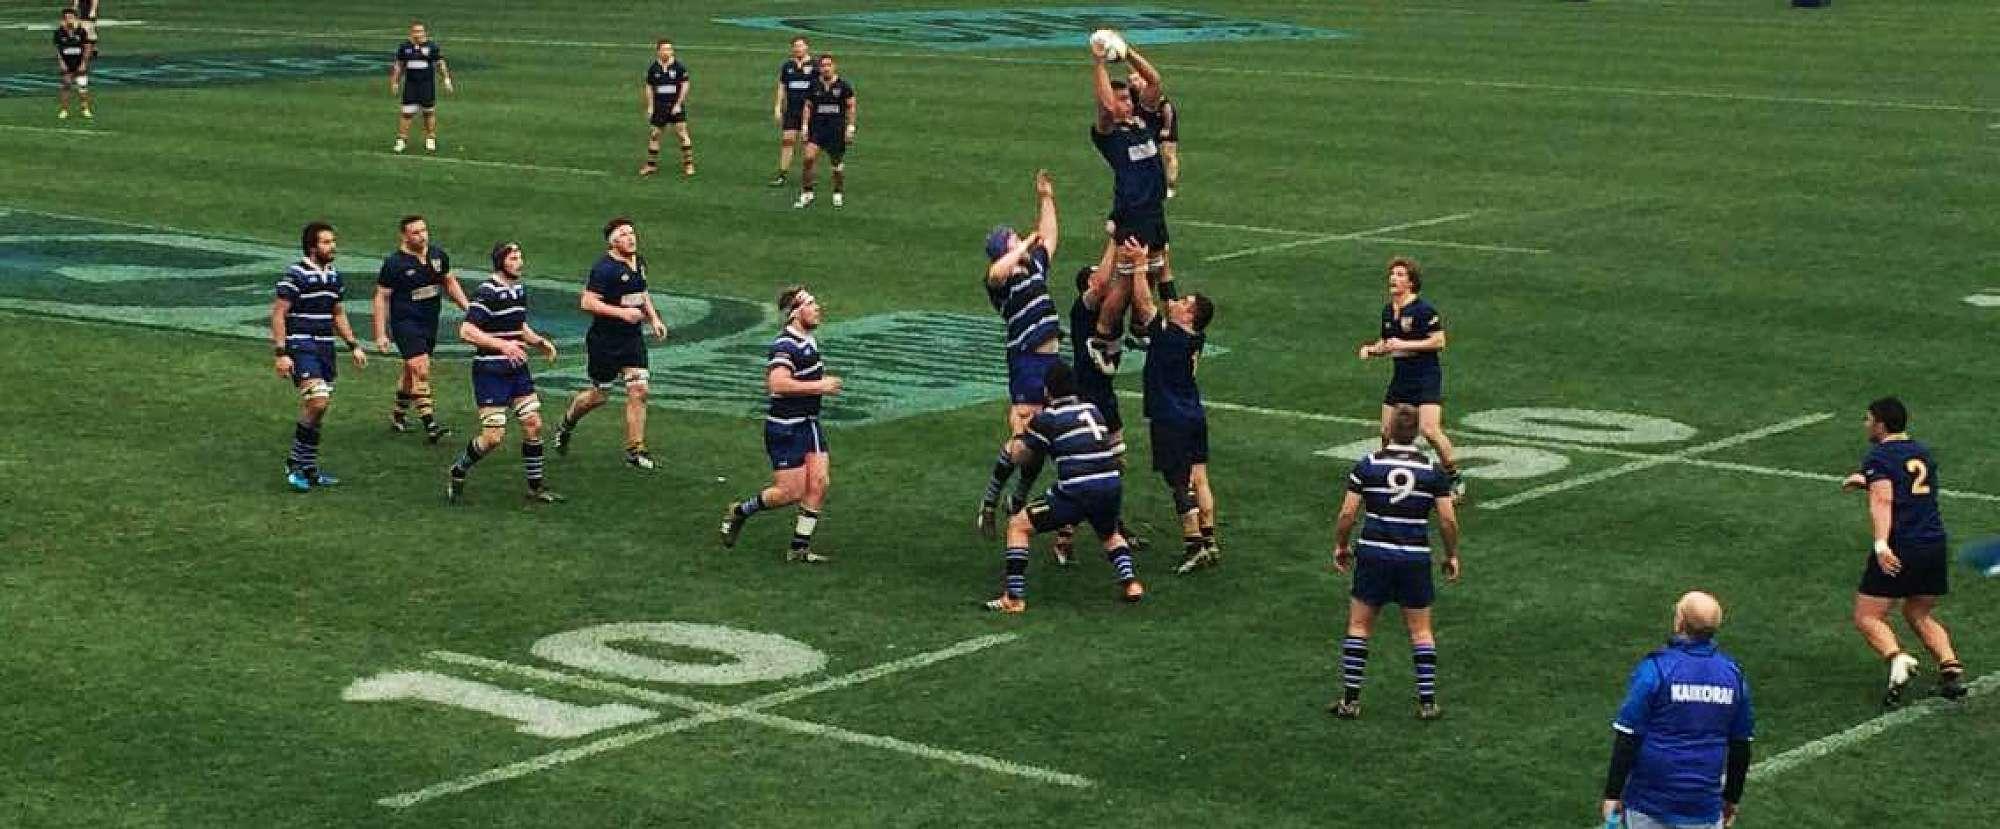 Dunedin v Kaikorai 2016 Premier Final